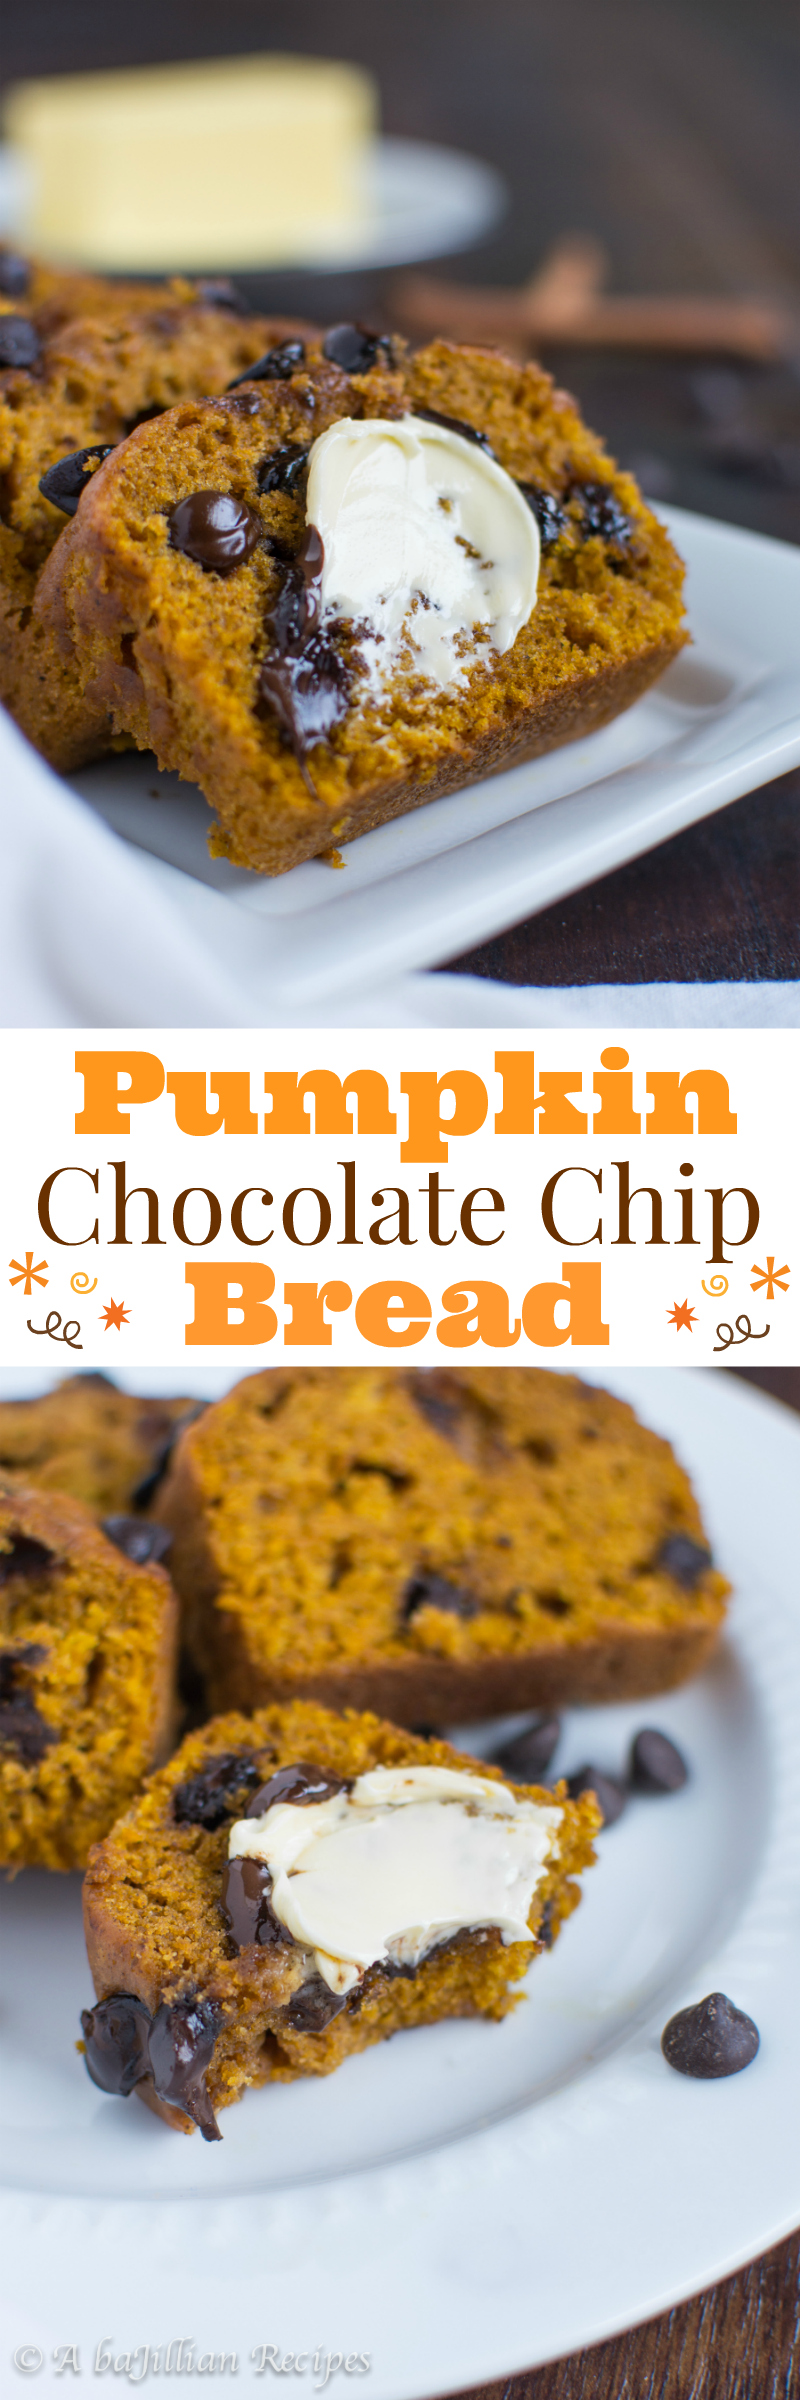 Pumpkin Chocolate Chip Bread - A baJillian Recipes